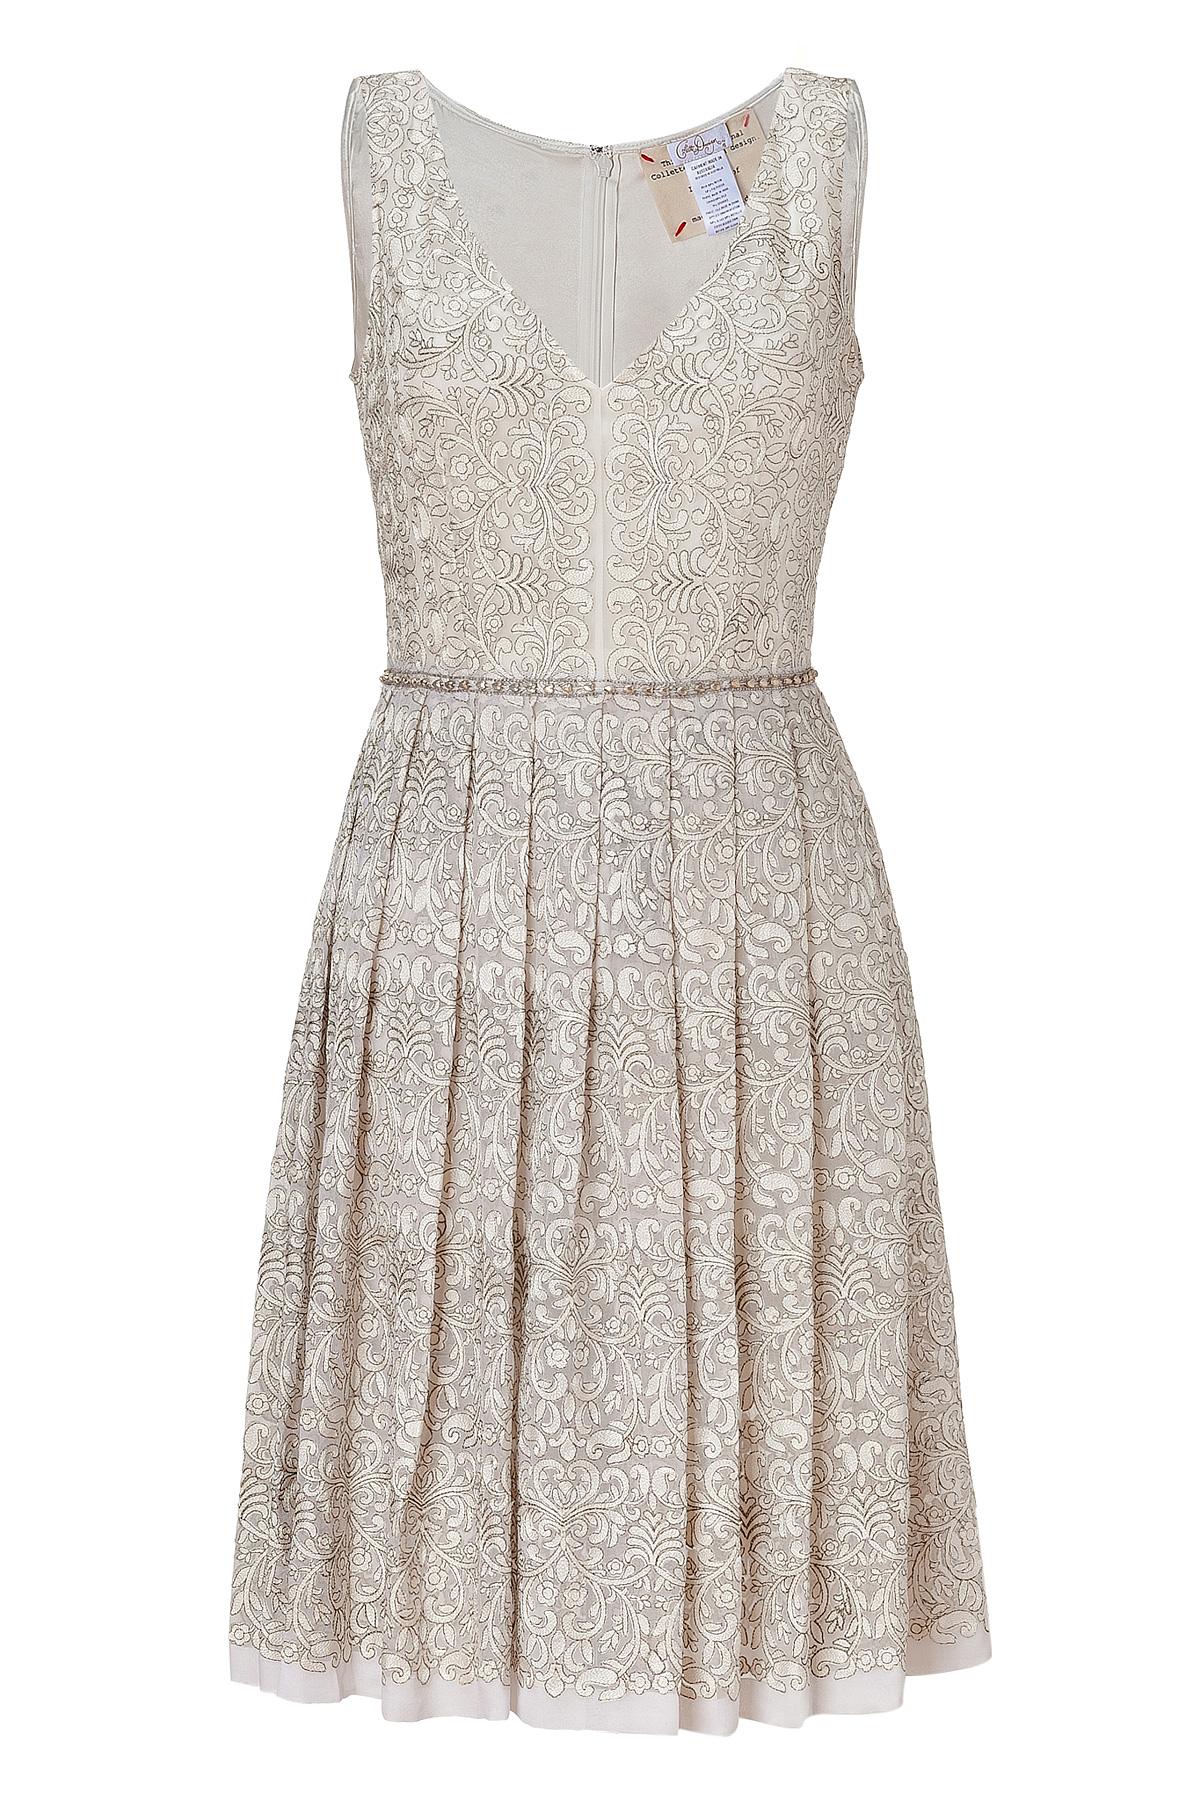 Linden Green Bridesmaids Dress from StyleBop